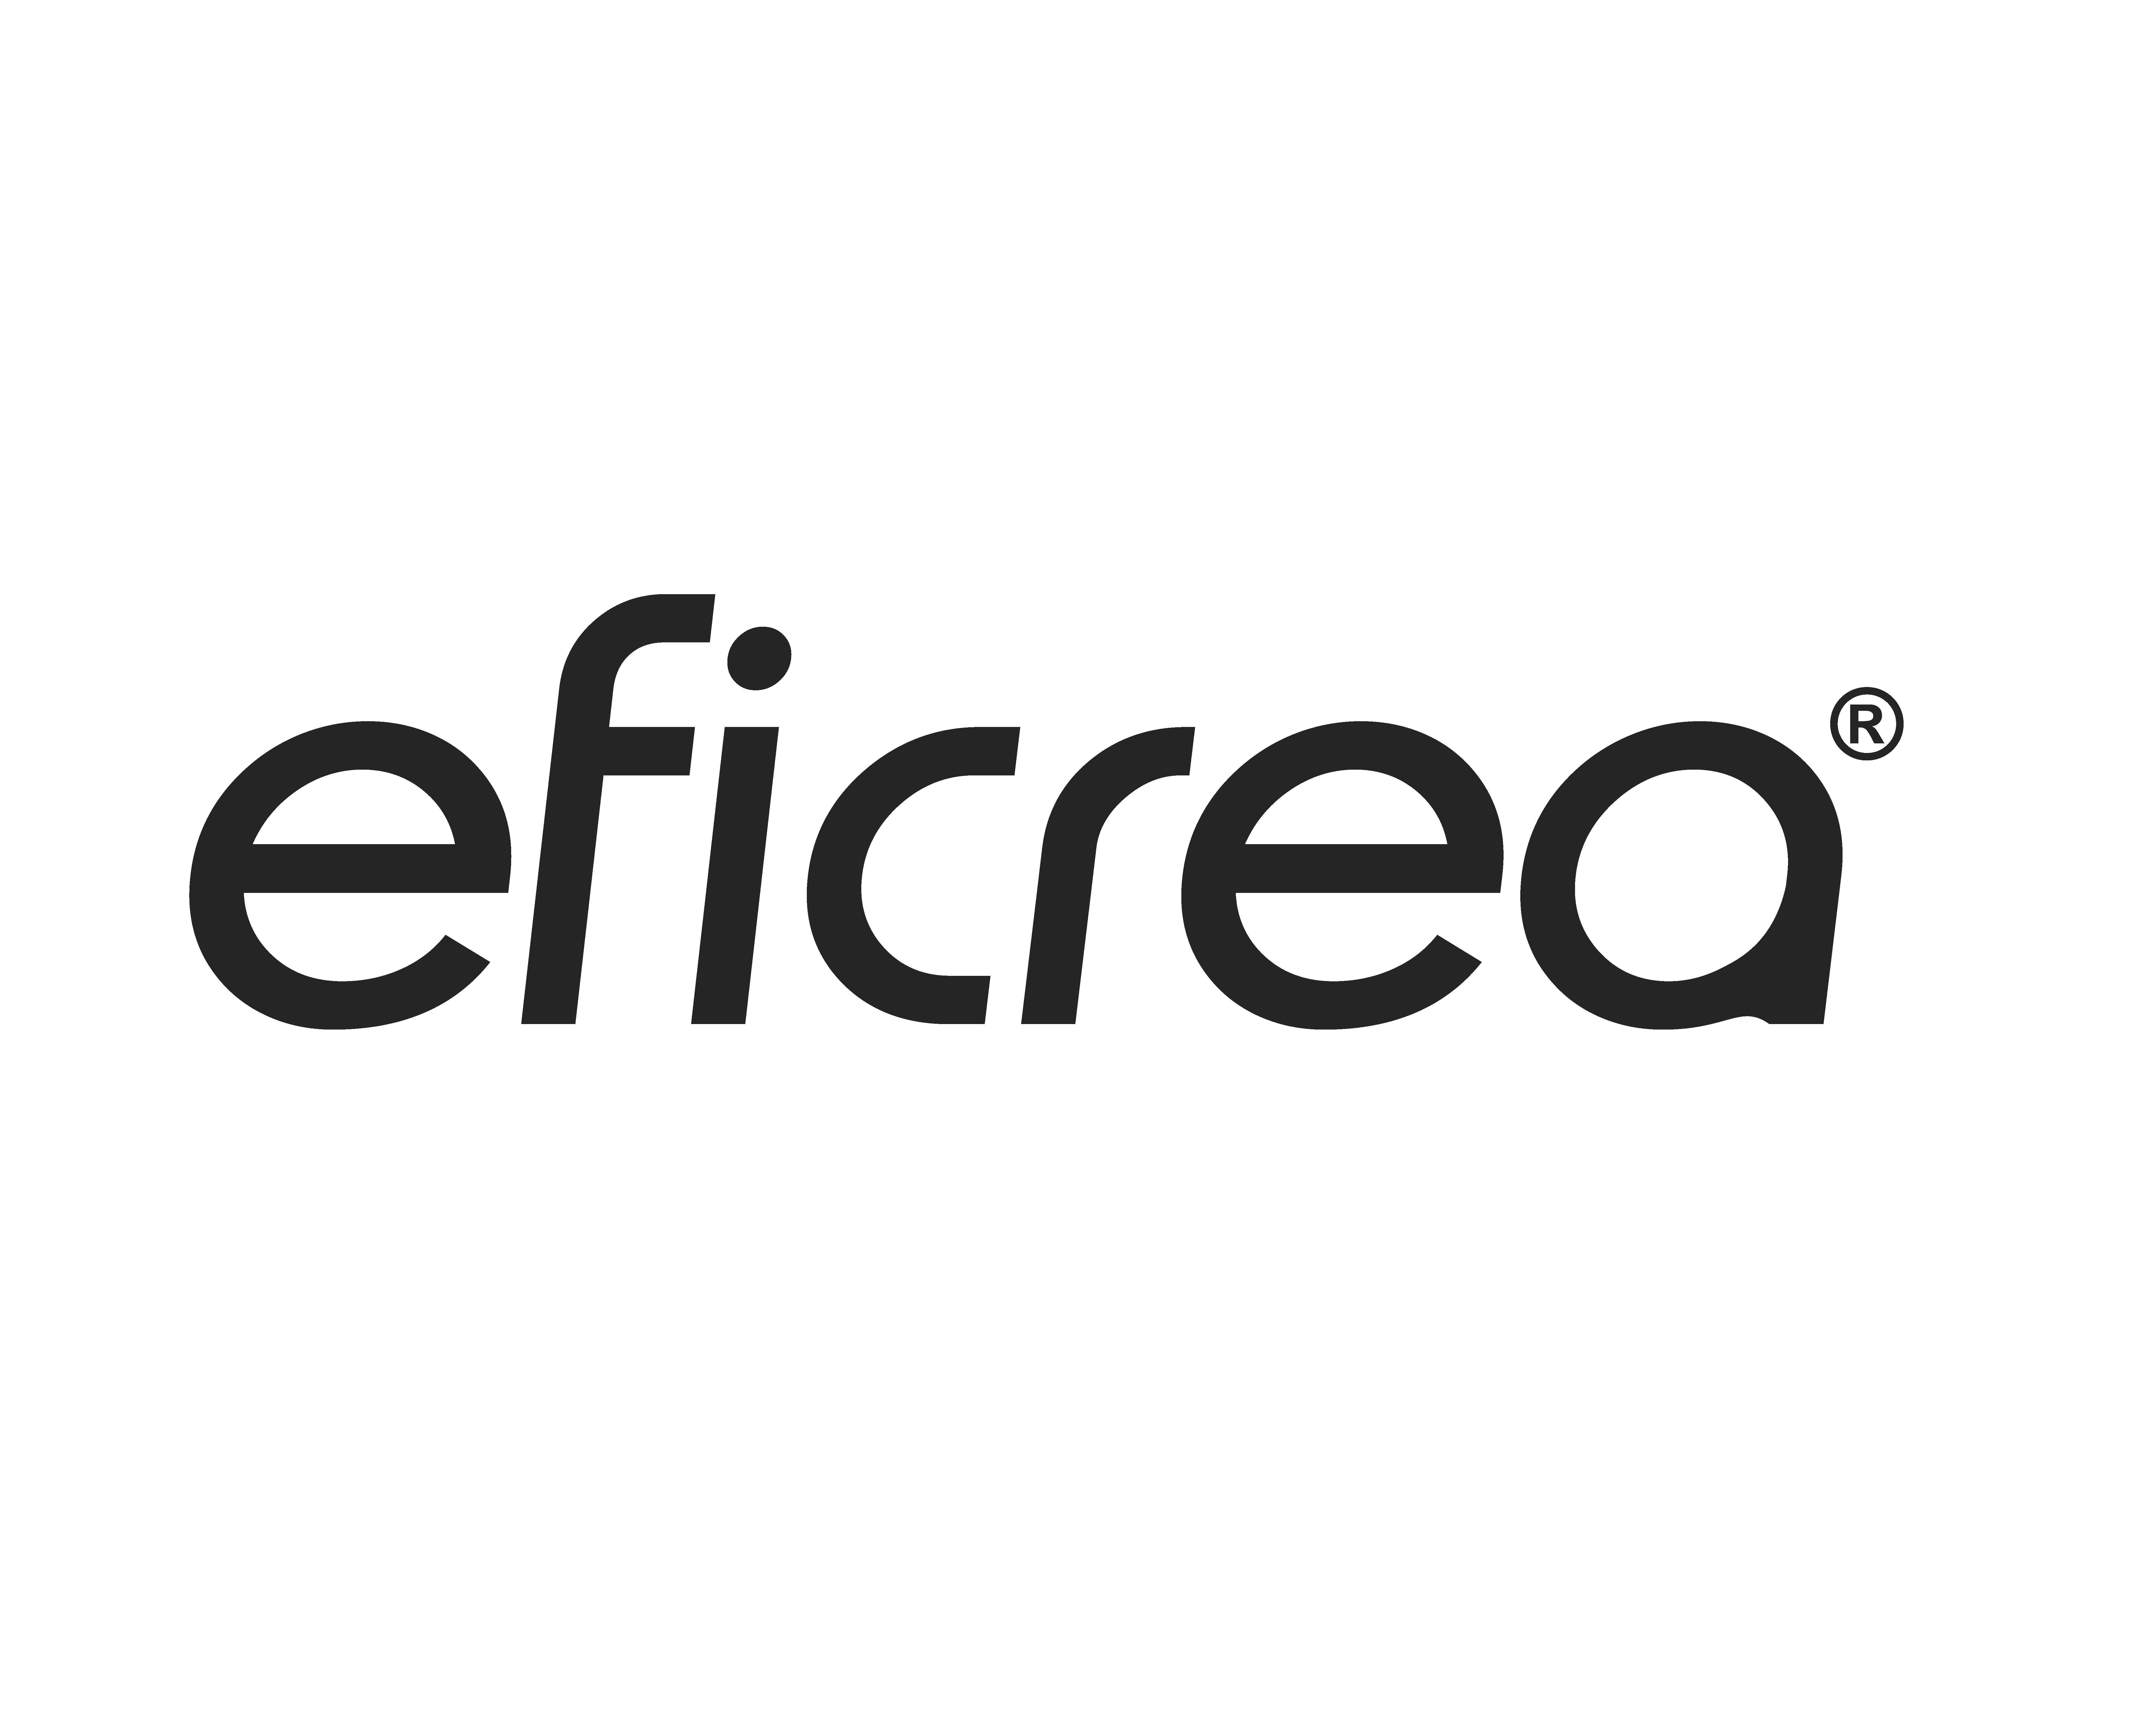 logo_EFICREA_2013